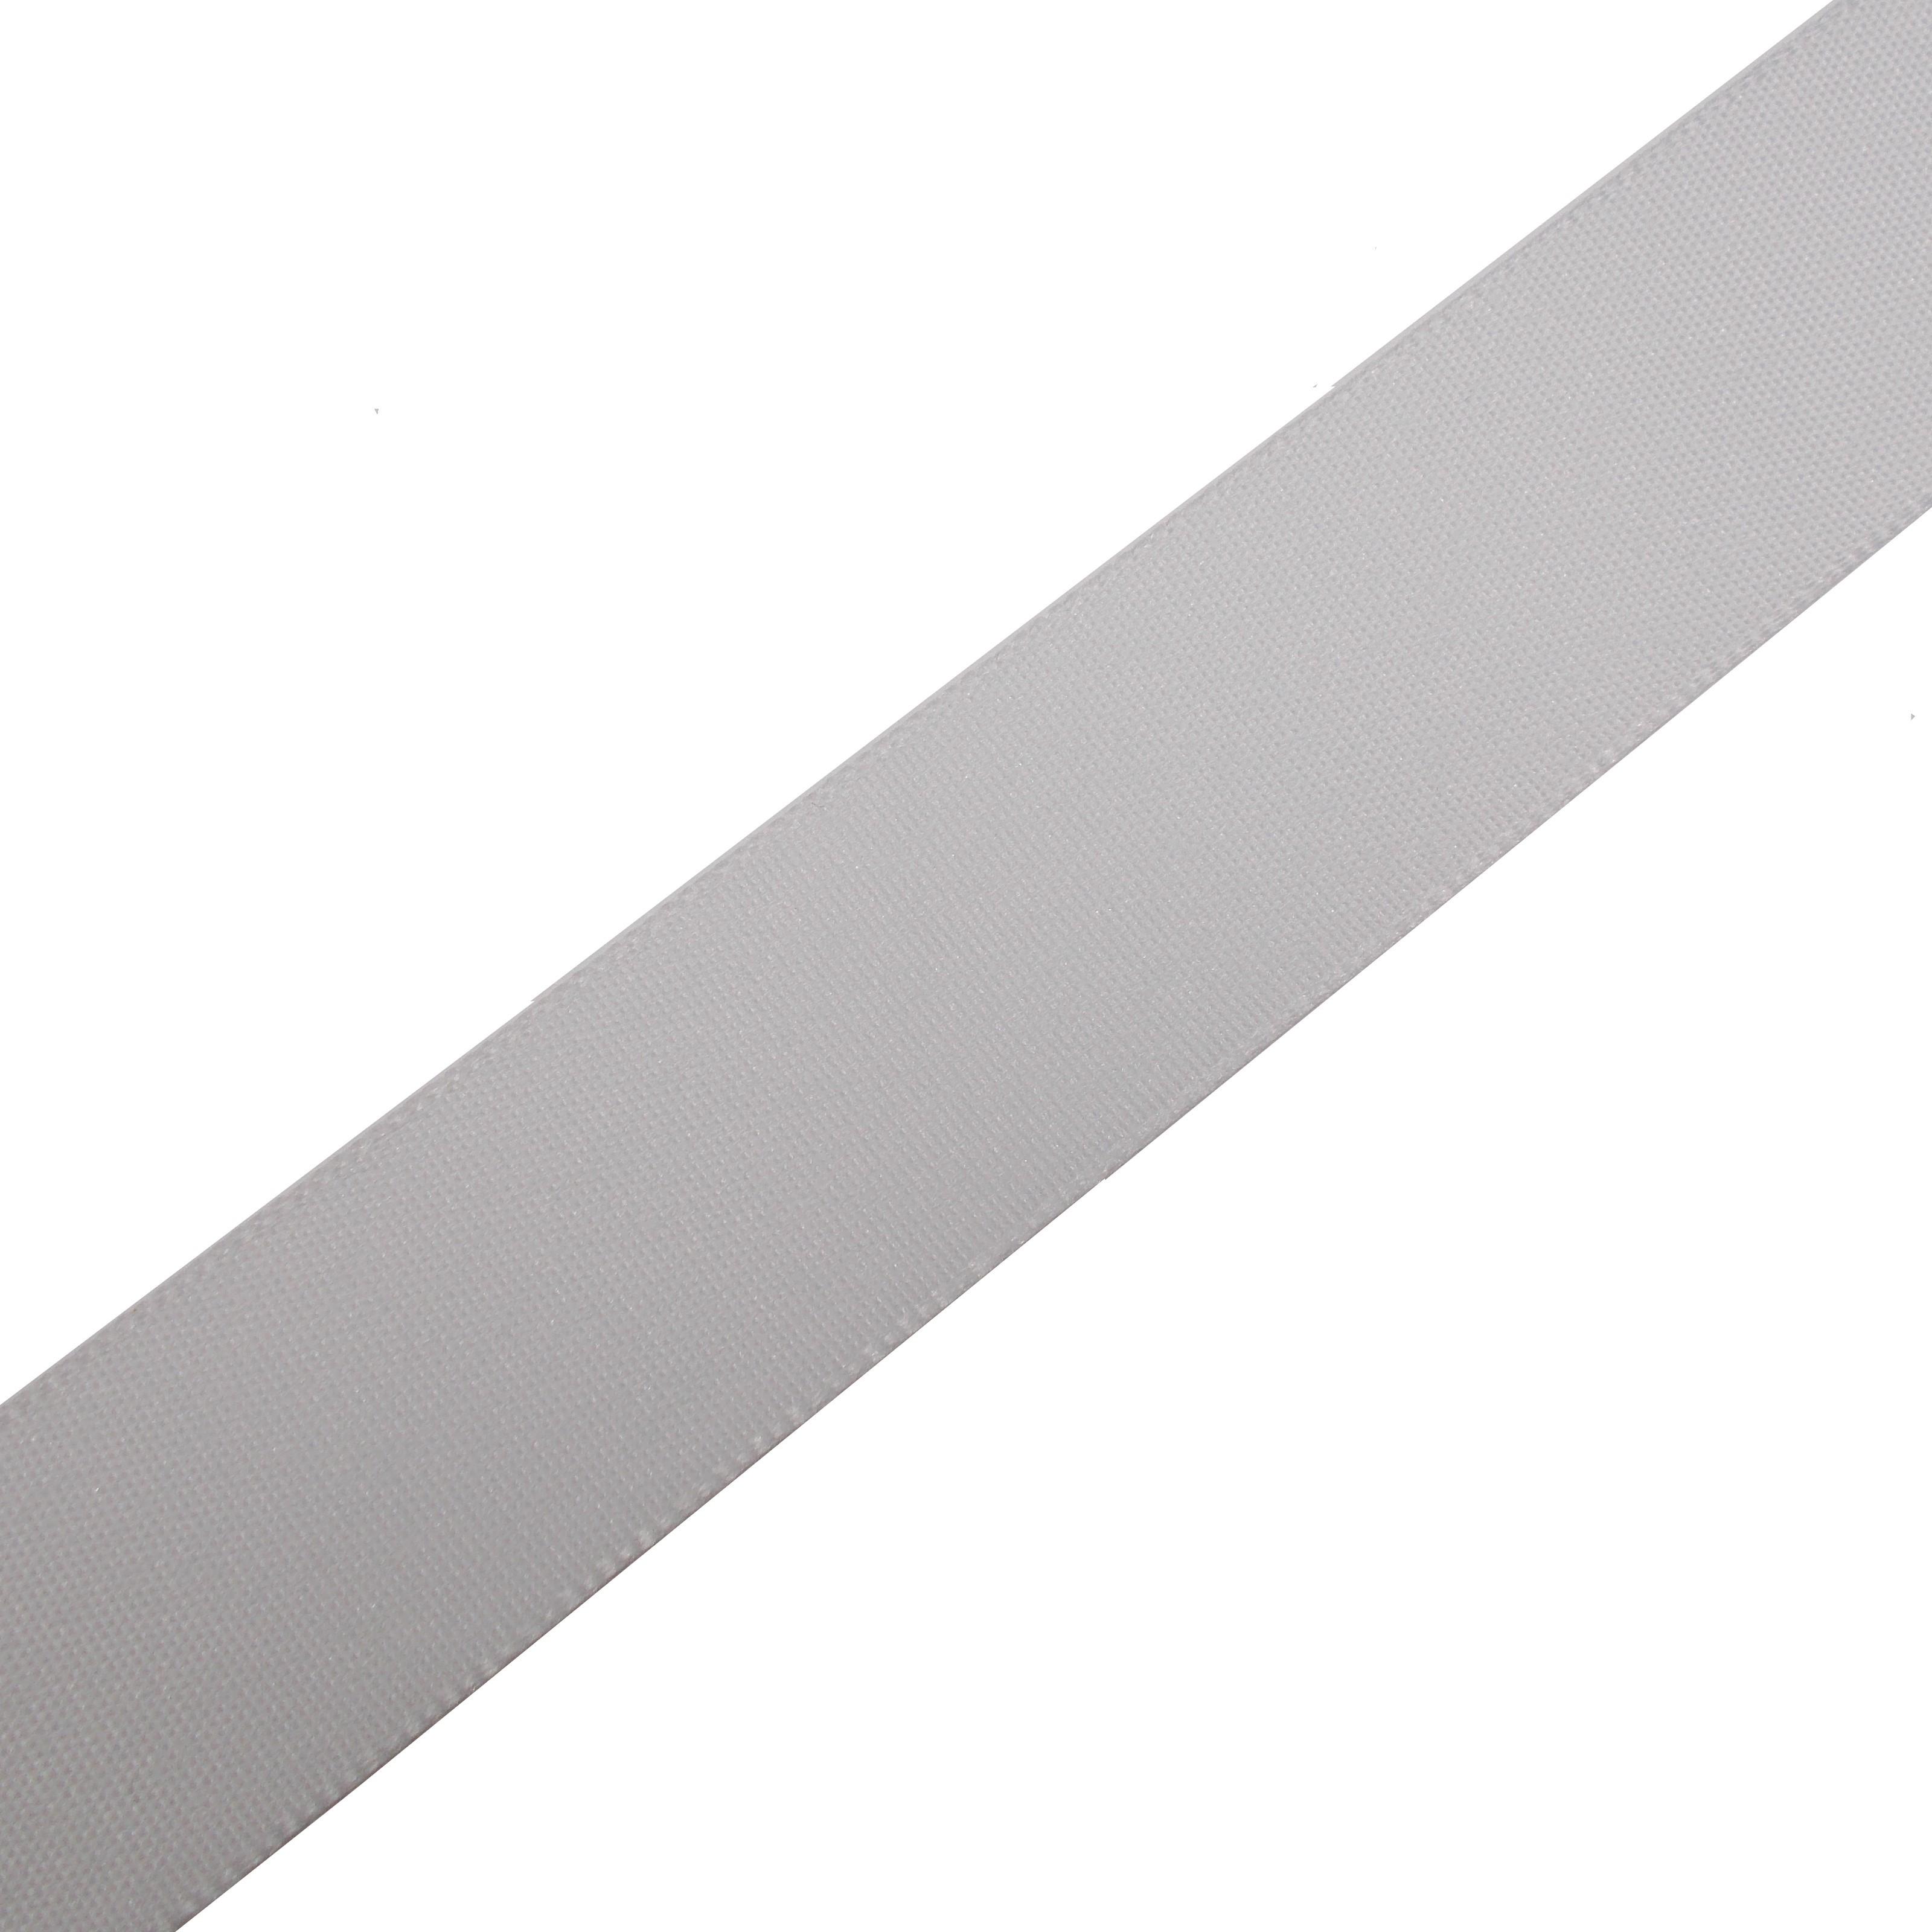 Berisfords Seam Binding Polyester Ribbon Tape 12mm wide White 2 metre length